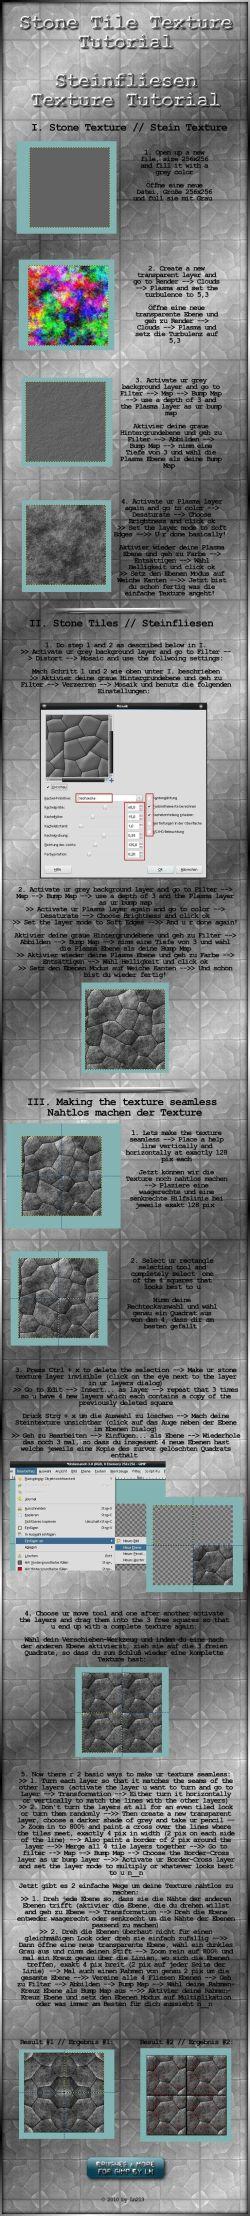 GIMP Stone Texture Tutorial by el L eN Imvu Group Texture Tutorials photo